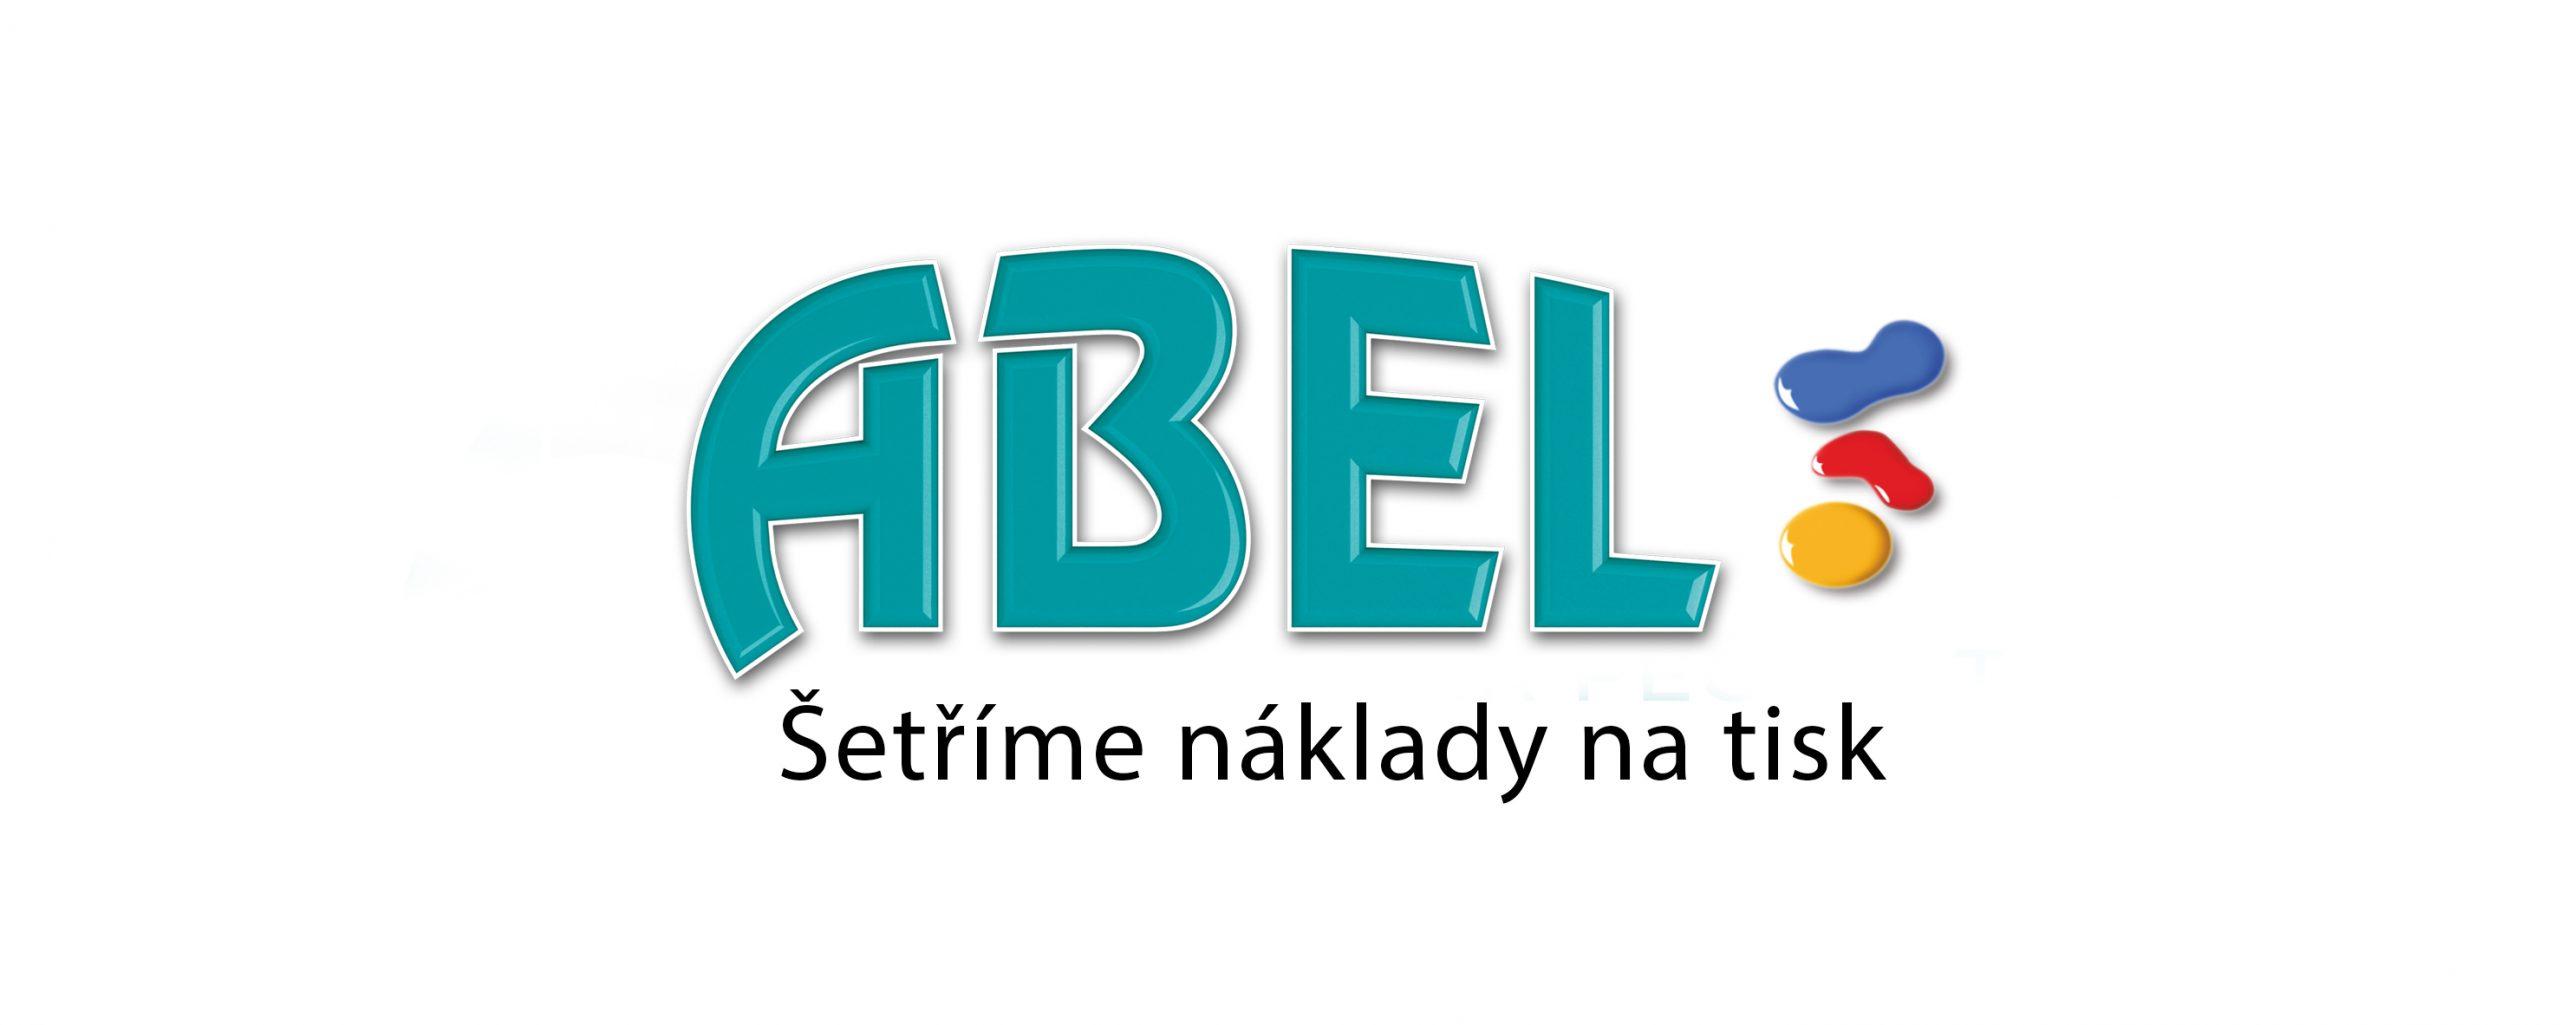 Dosavadní logo